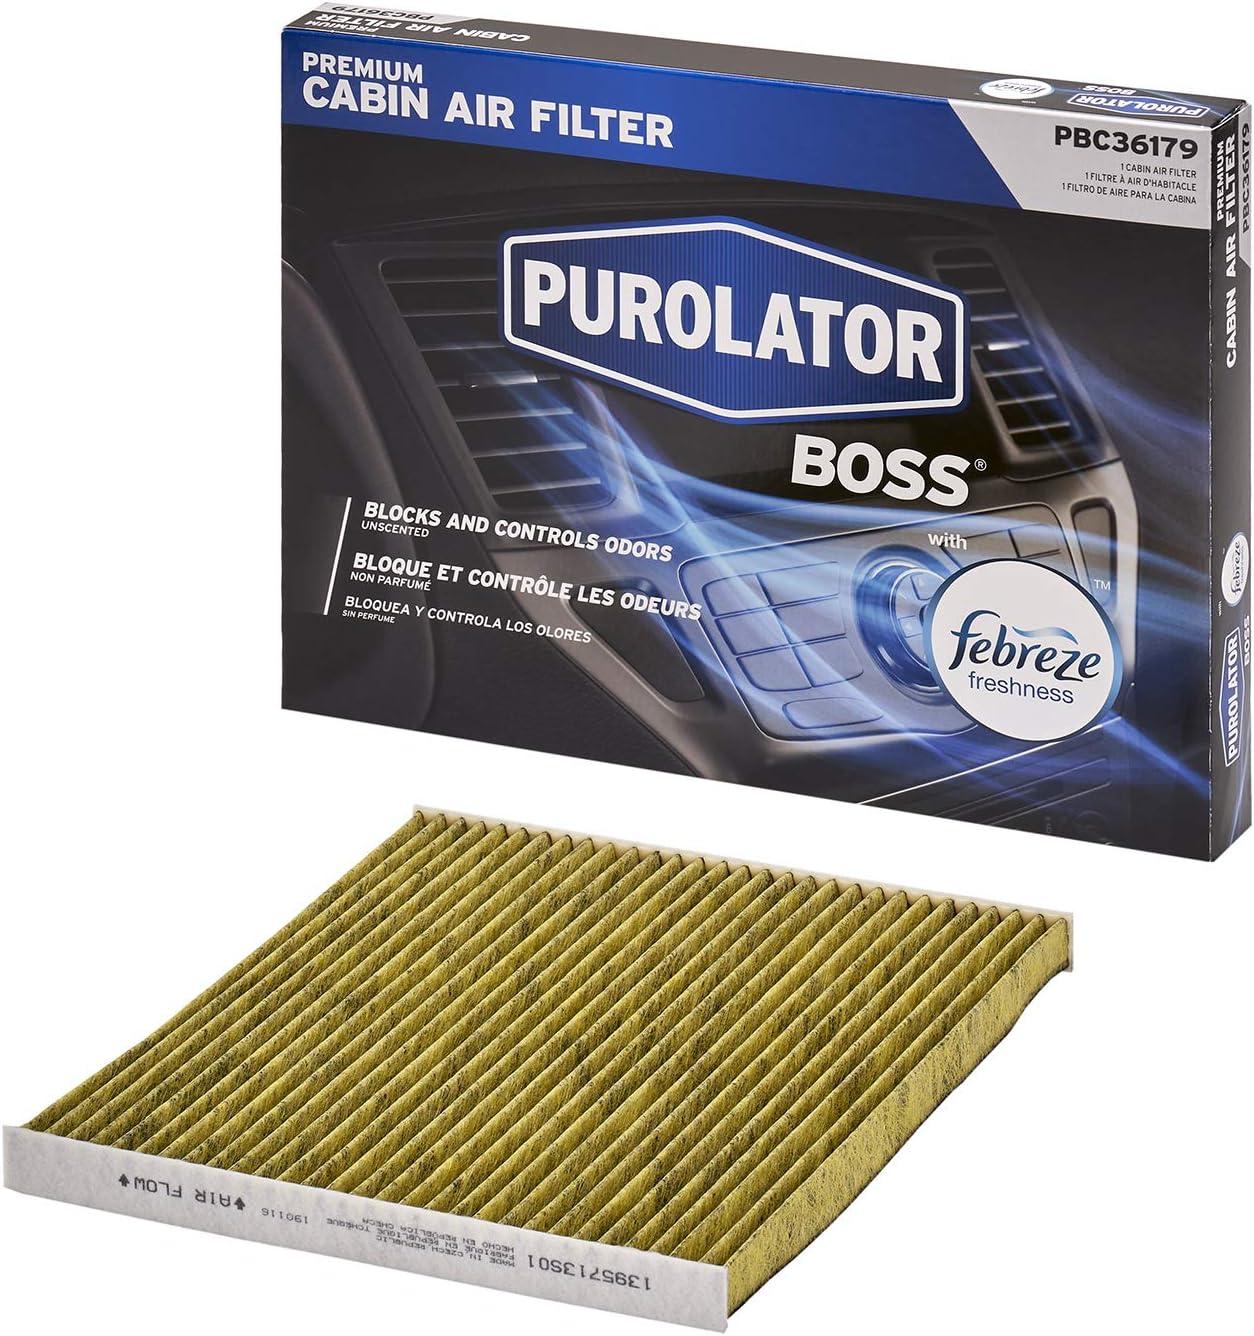 Purolator C36179 Single Cabin Air Filter